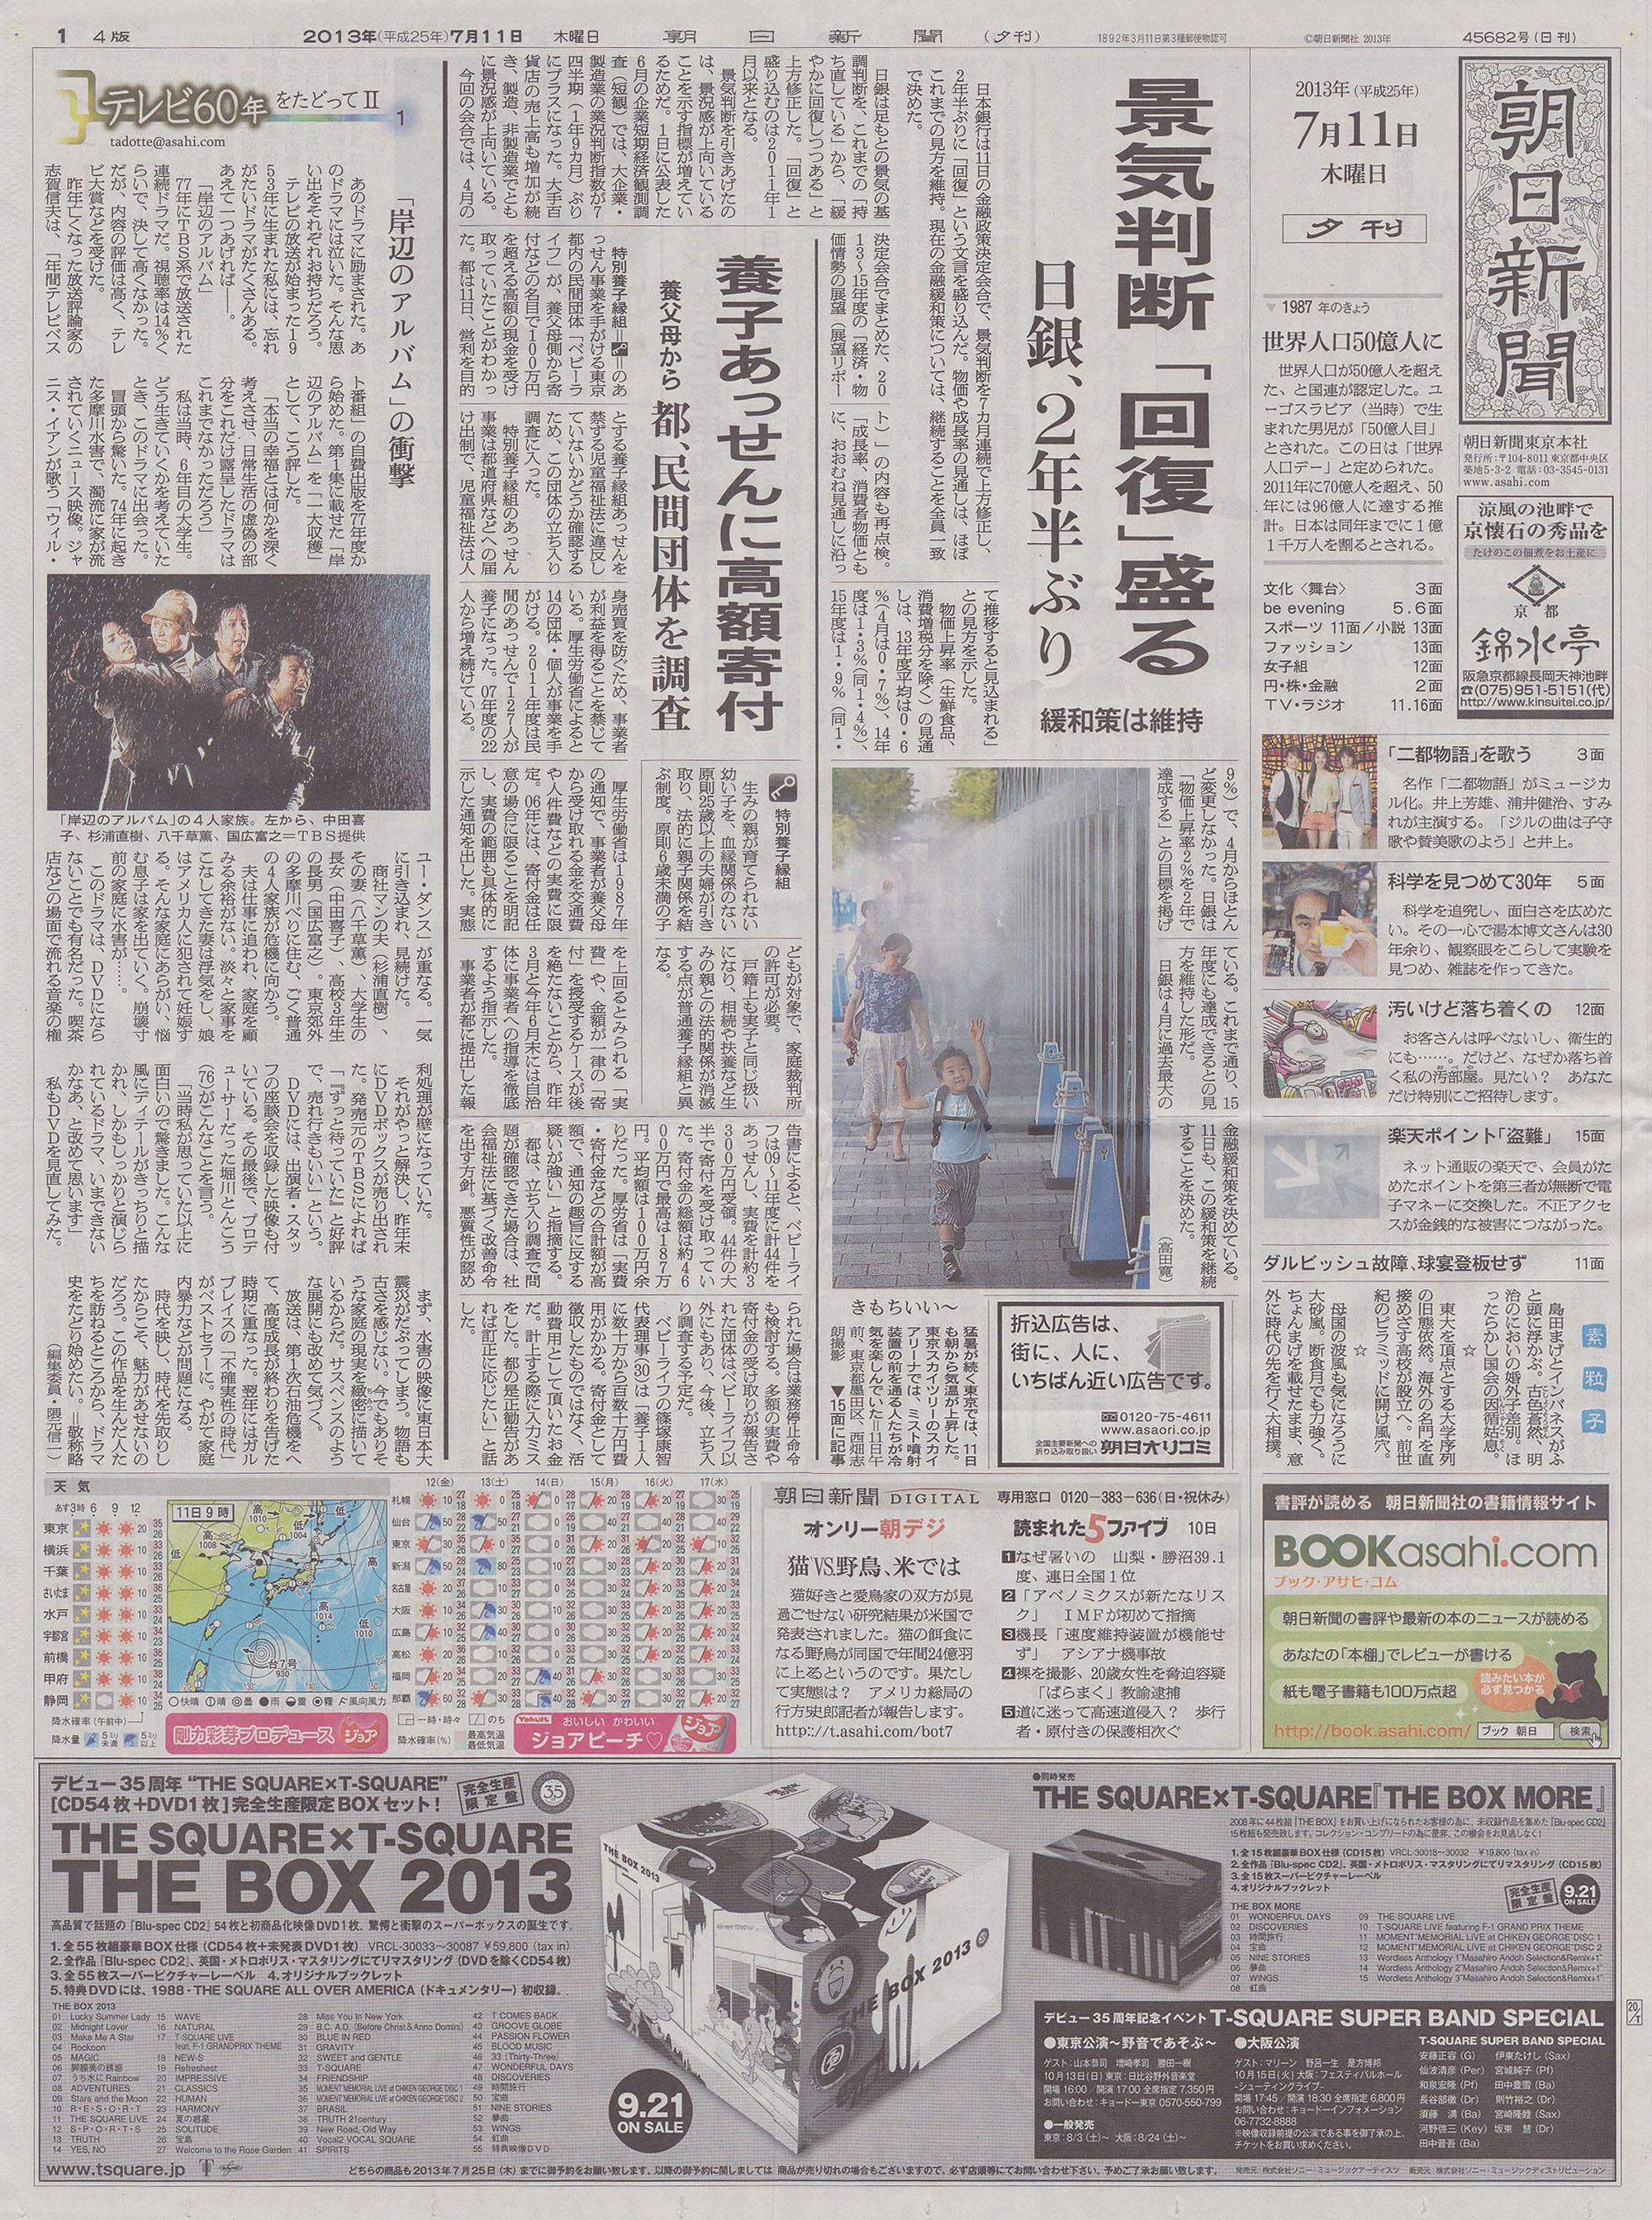 Asahi Shimbun July 11 2013 Zack Hample